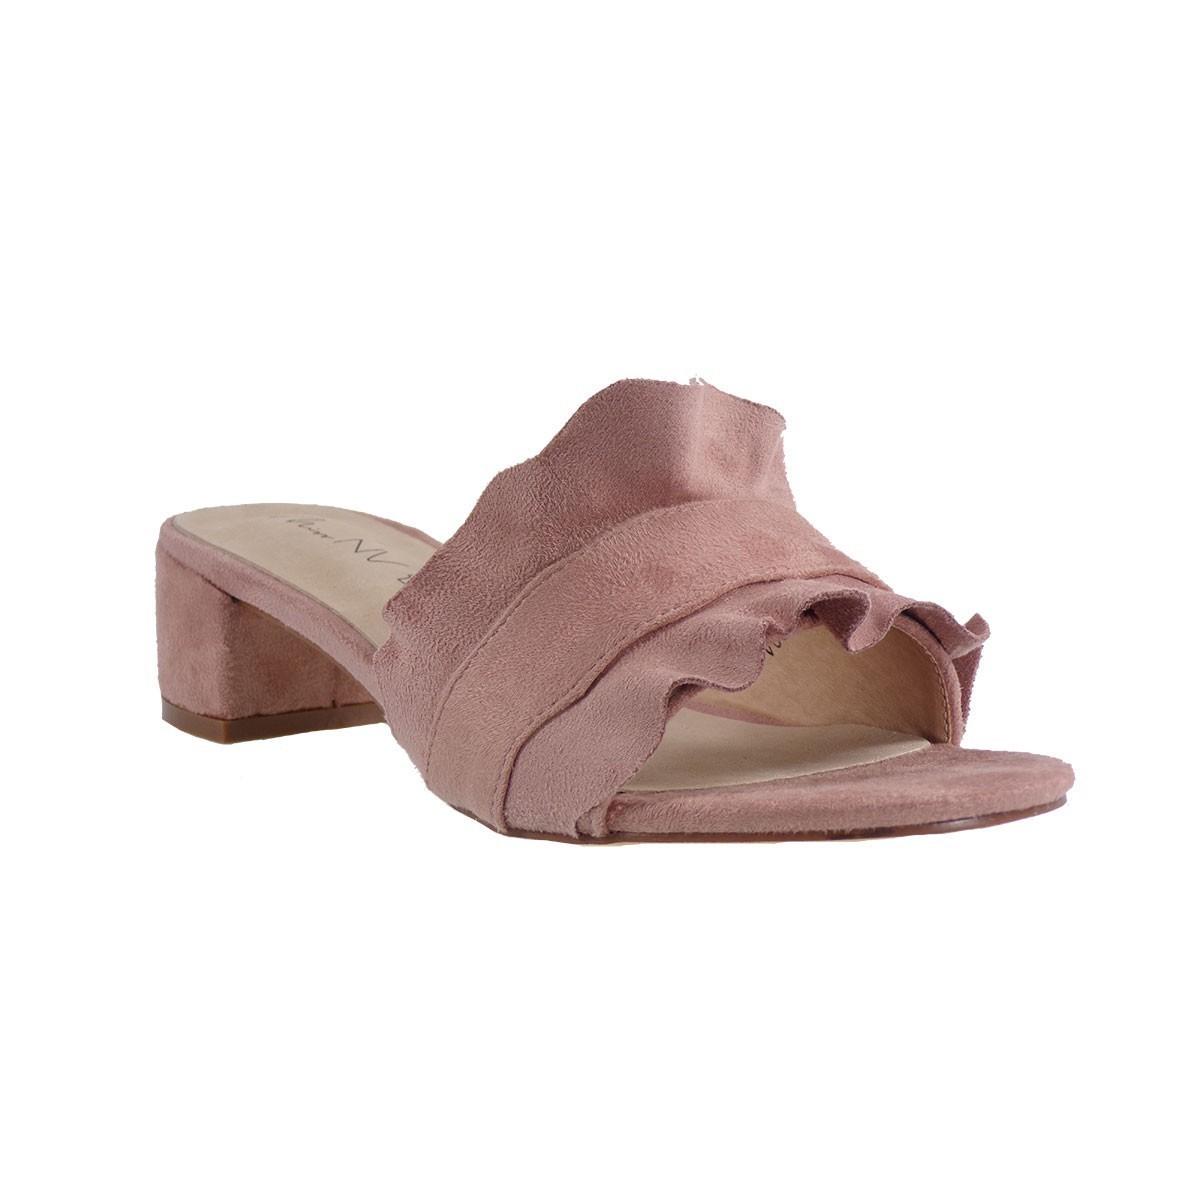 MISS NV Γυναικεία Παντόφλες Mules V65-07874 Ρόζ